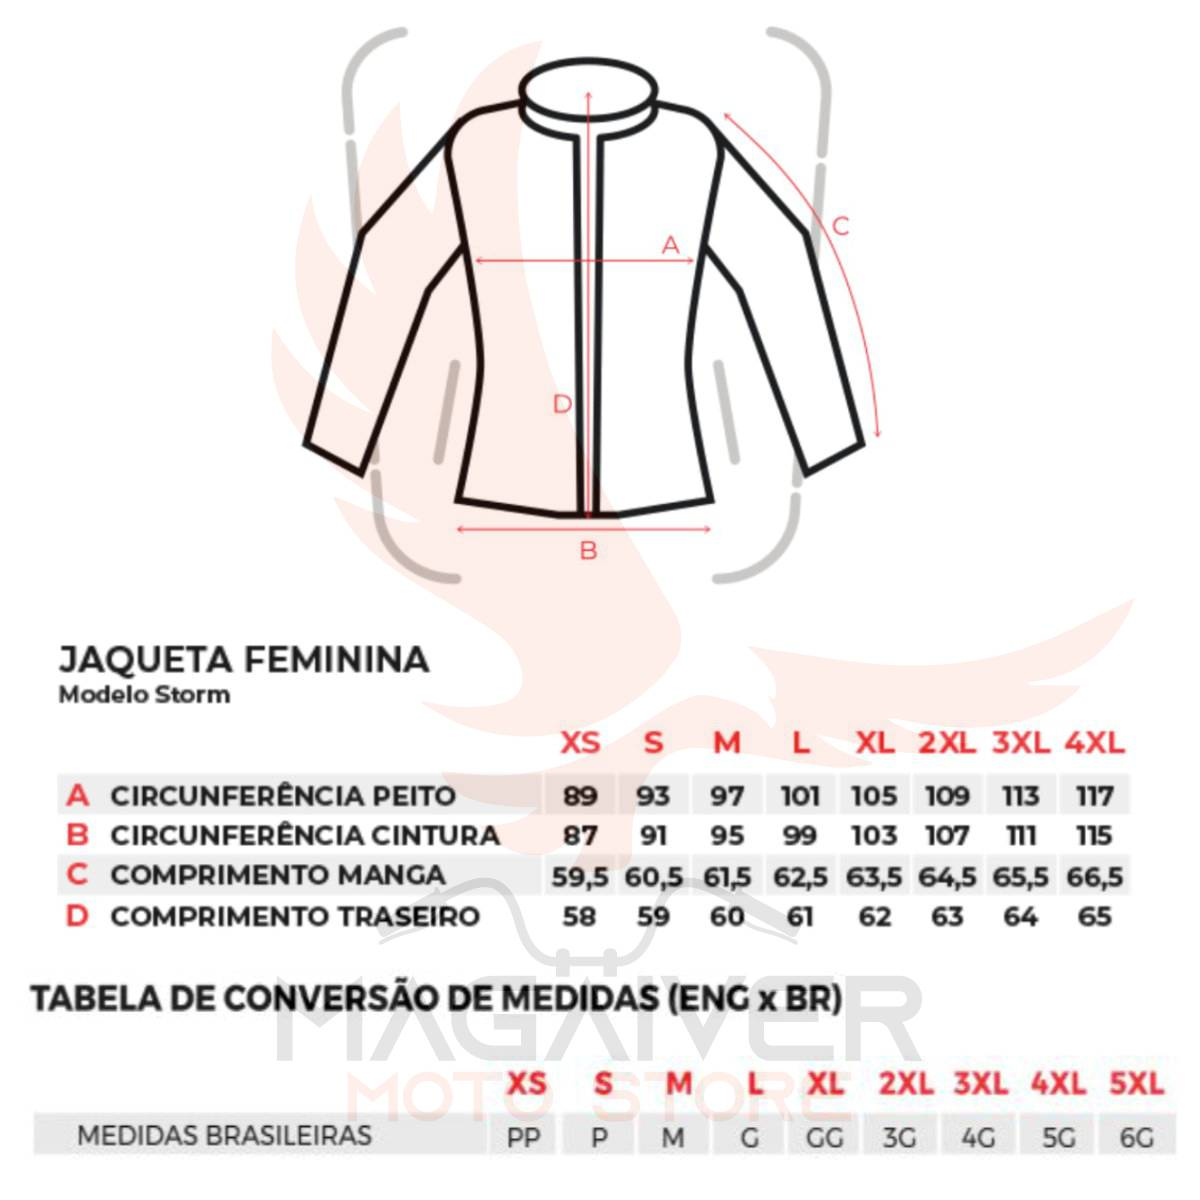 JAQUETA DE COURO MOTOCICLISTA FEMININA TEXX STORM LADY G + CAPACETE DE MOTO AXXIS DREAMS FOSCO Nº 56